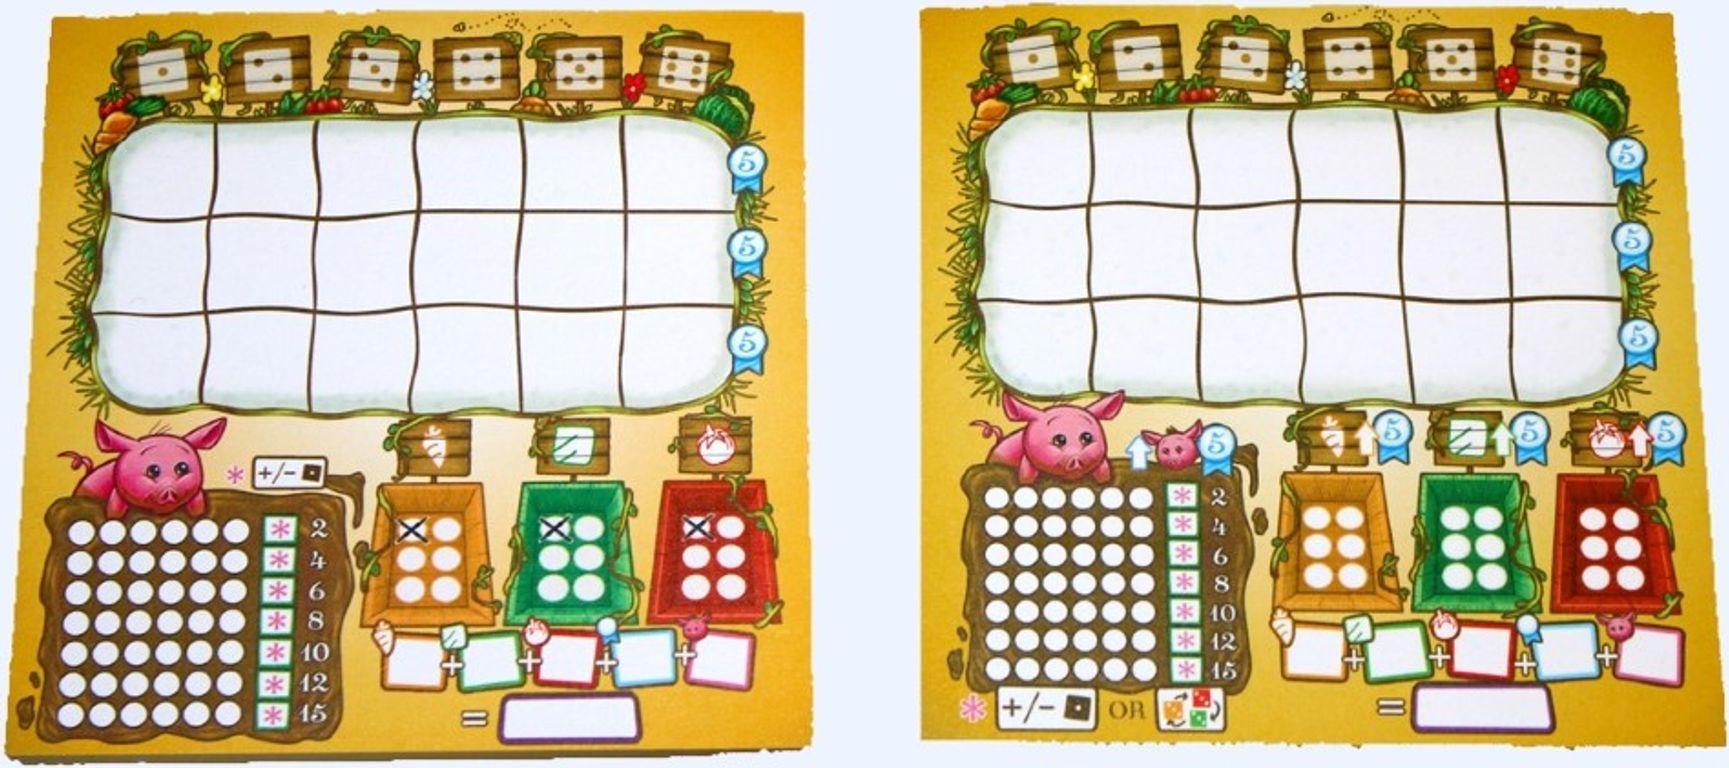 Harvest Dice game board